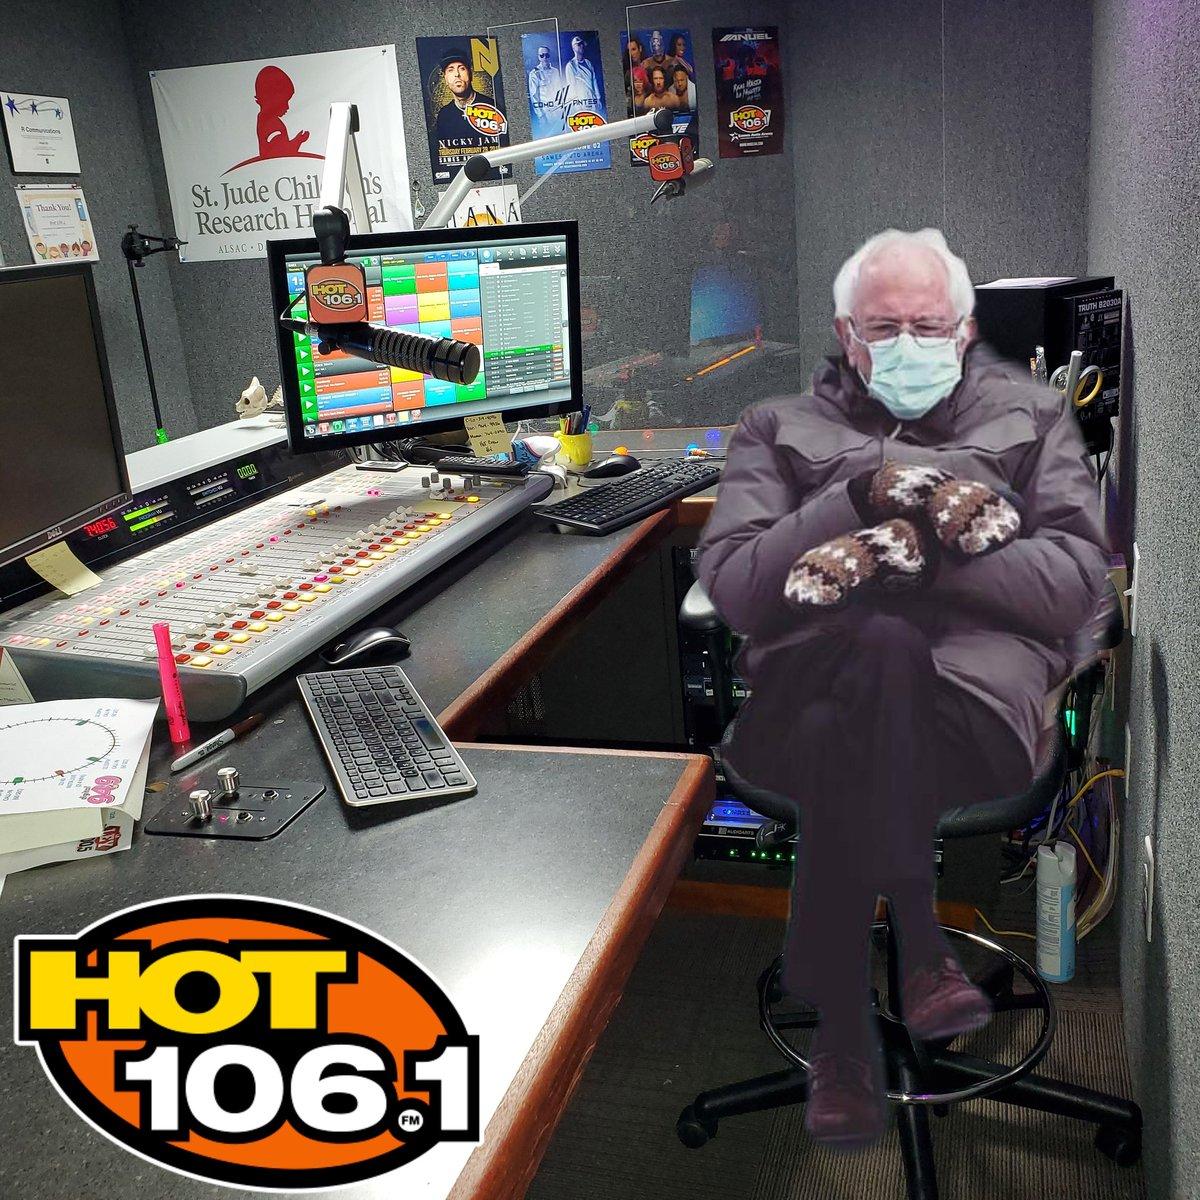 DJ Bernie in the Hot Studio! 👍🏽👍🏽👍🏽  #LateNightLove is on now with @c_lo1061!!! 😁😁😁 #IAmHot1061 #BernieMemes